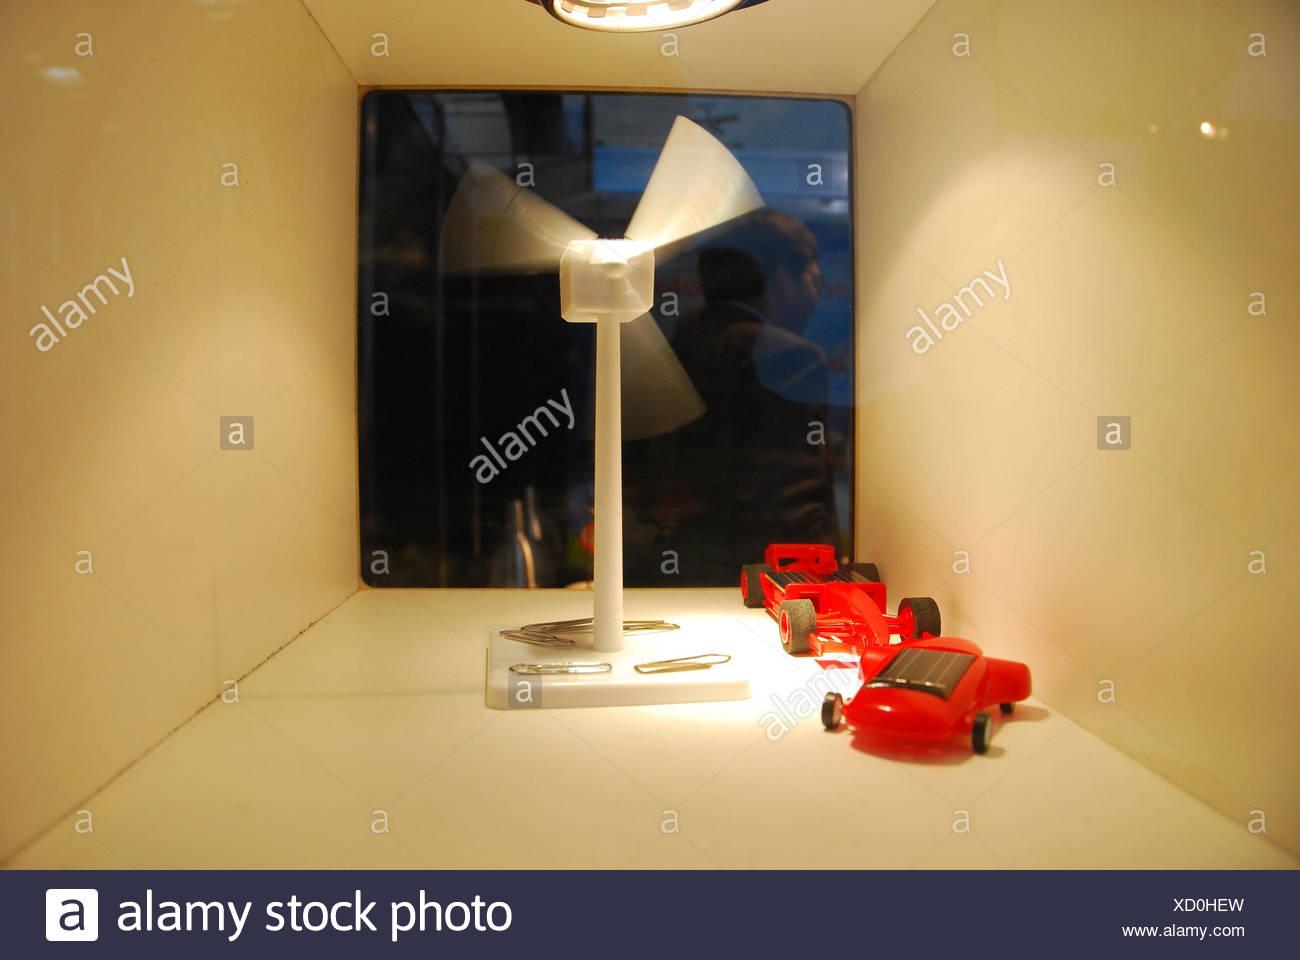 Solar energy, models, wind turbine, solar cars, - Stock Image